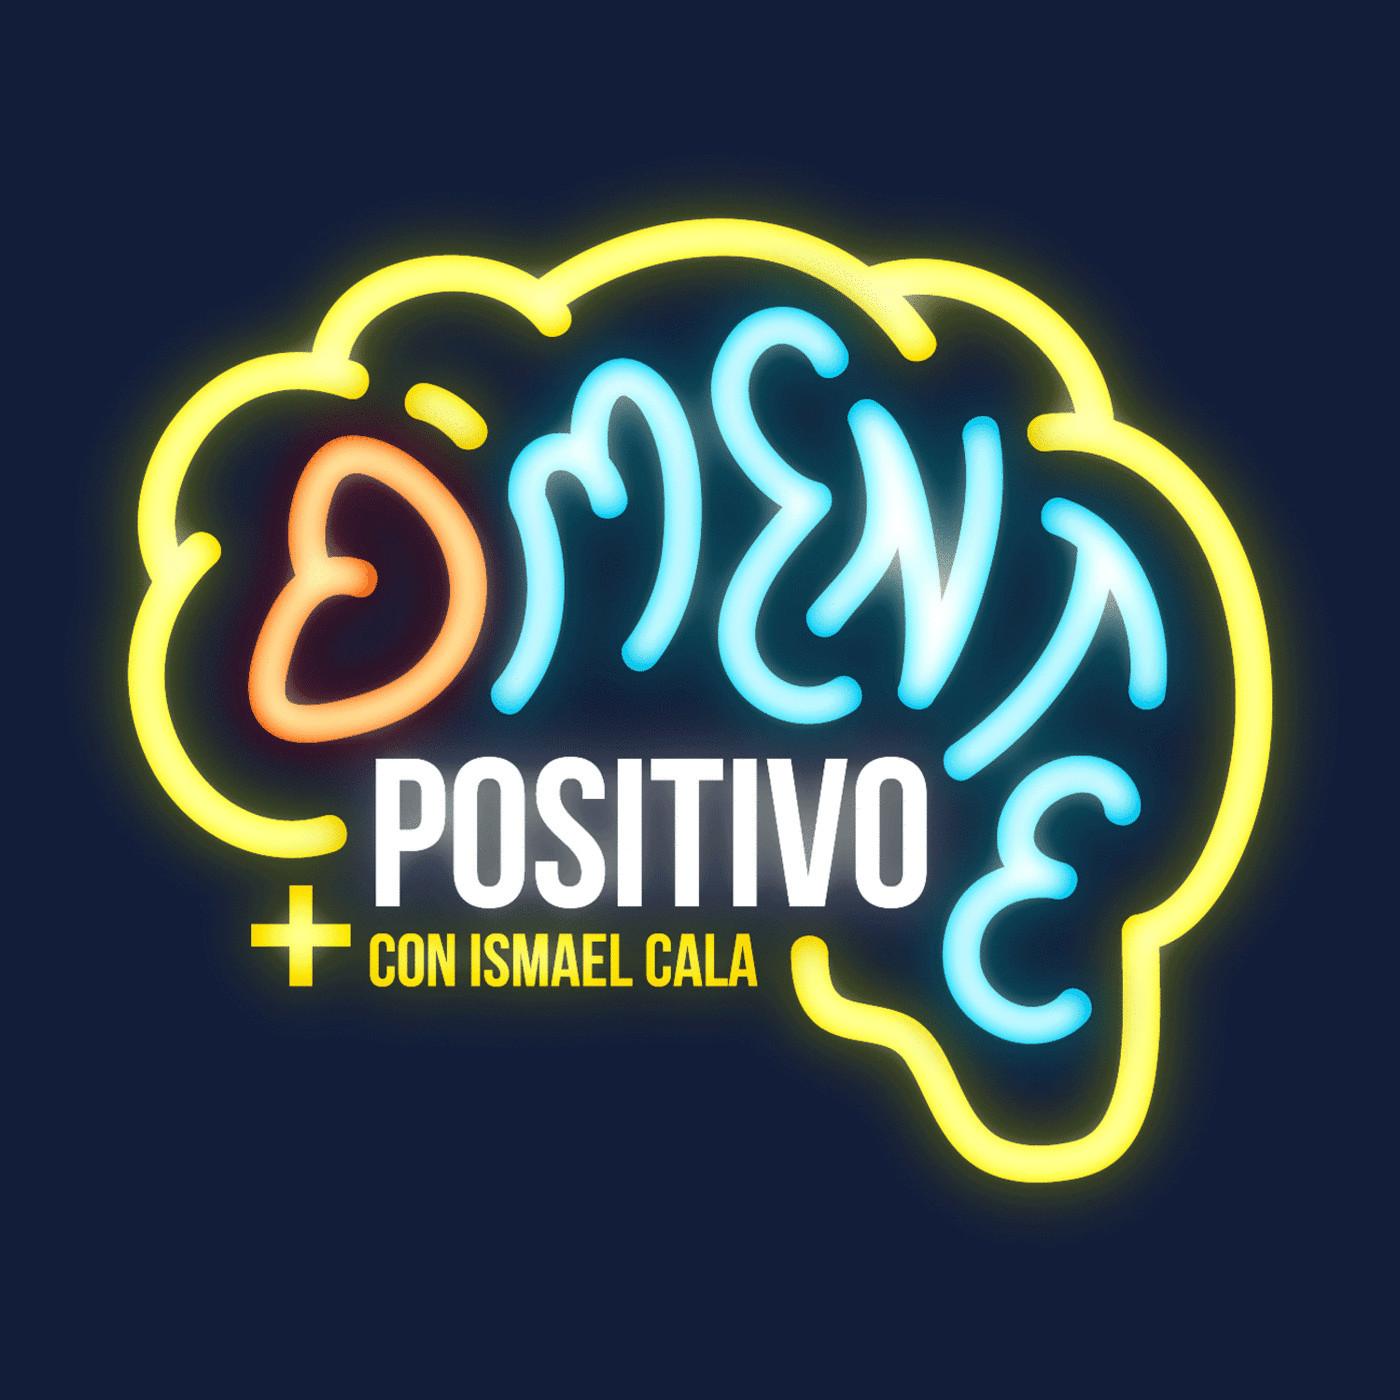 Neurociencias al día con Facundo Manes en D'mente Positivo